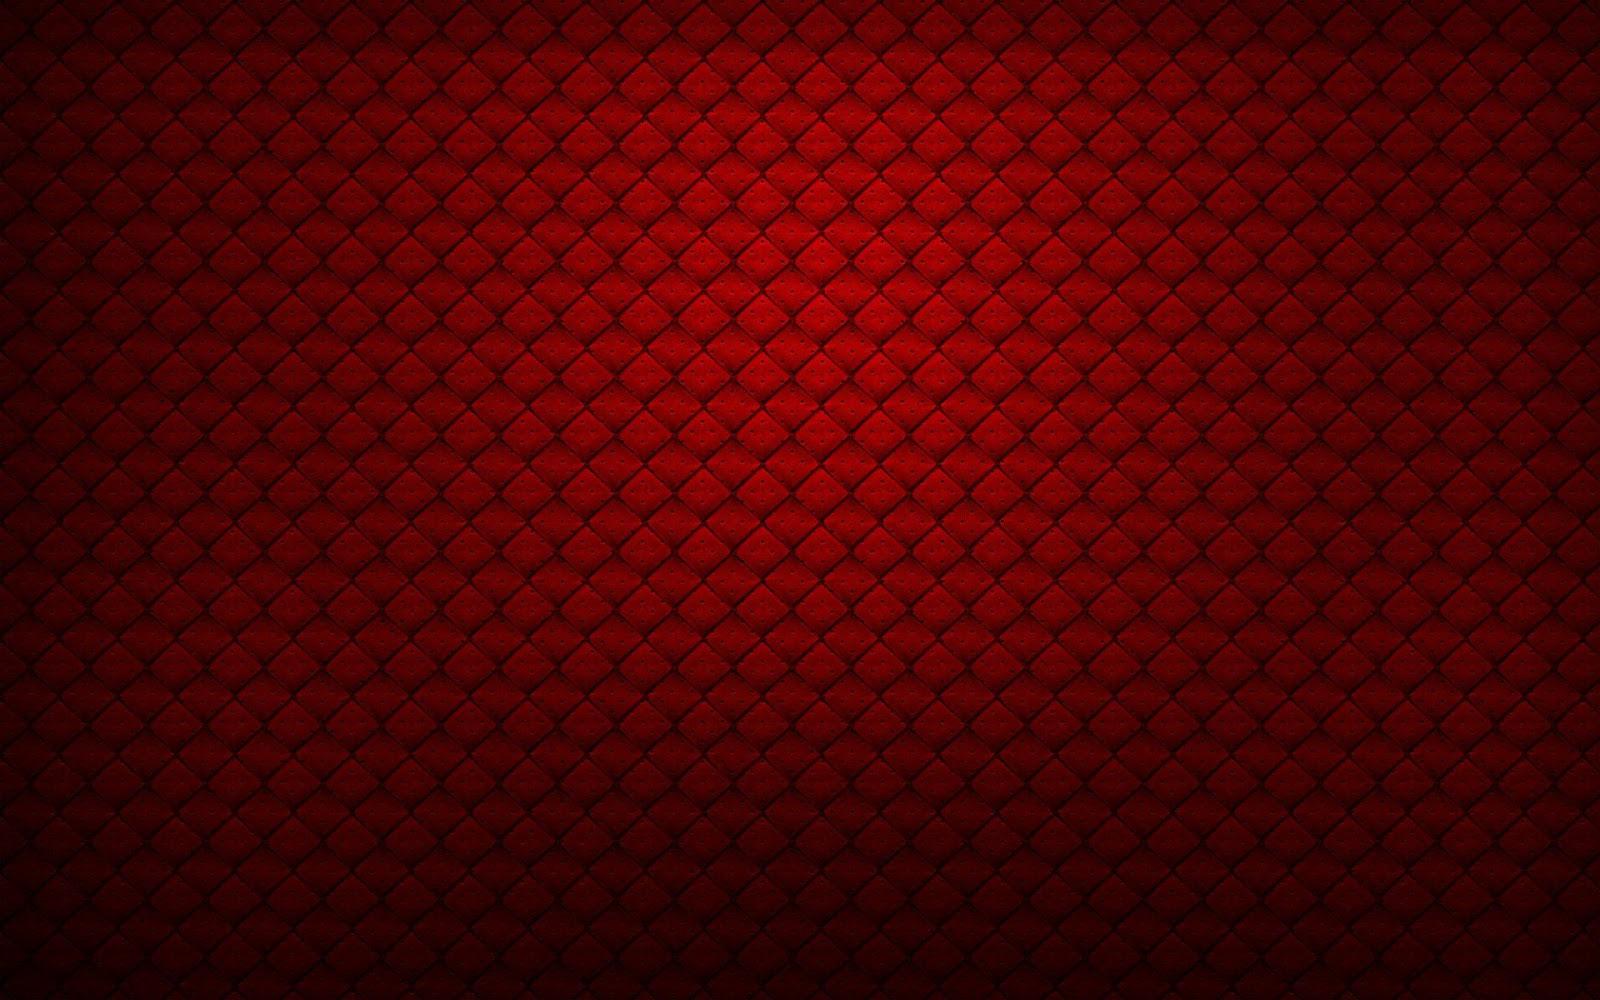 [48+] Red Wallpapers HD on WallpaperSafari